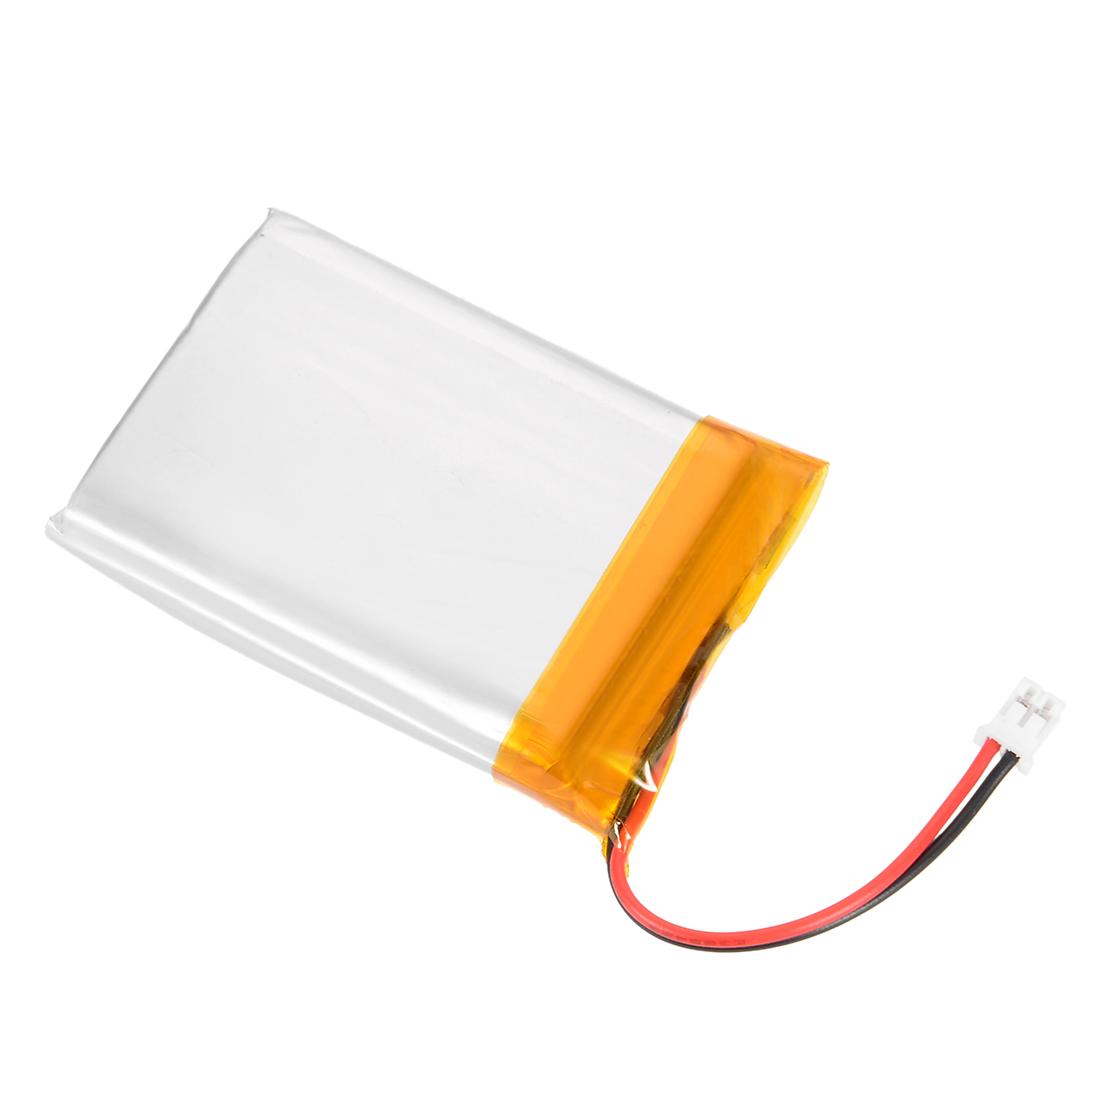 Power Supply DC 3.7V 2300mAh 924260 Rechargeable Lithium Polymer Li-Po Battery - image 2 de 5